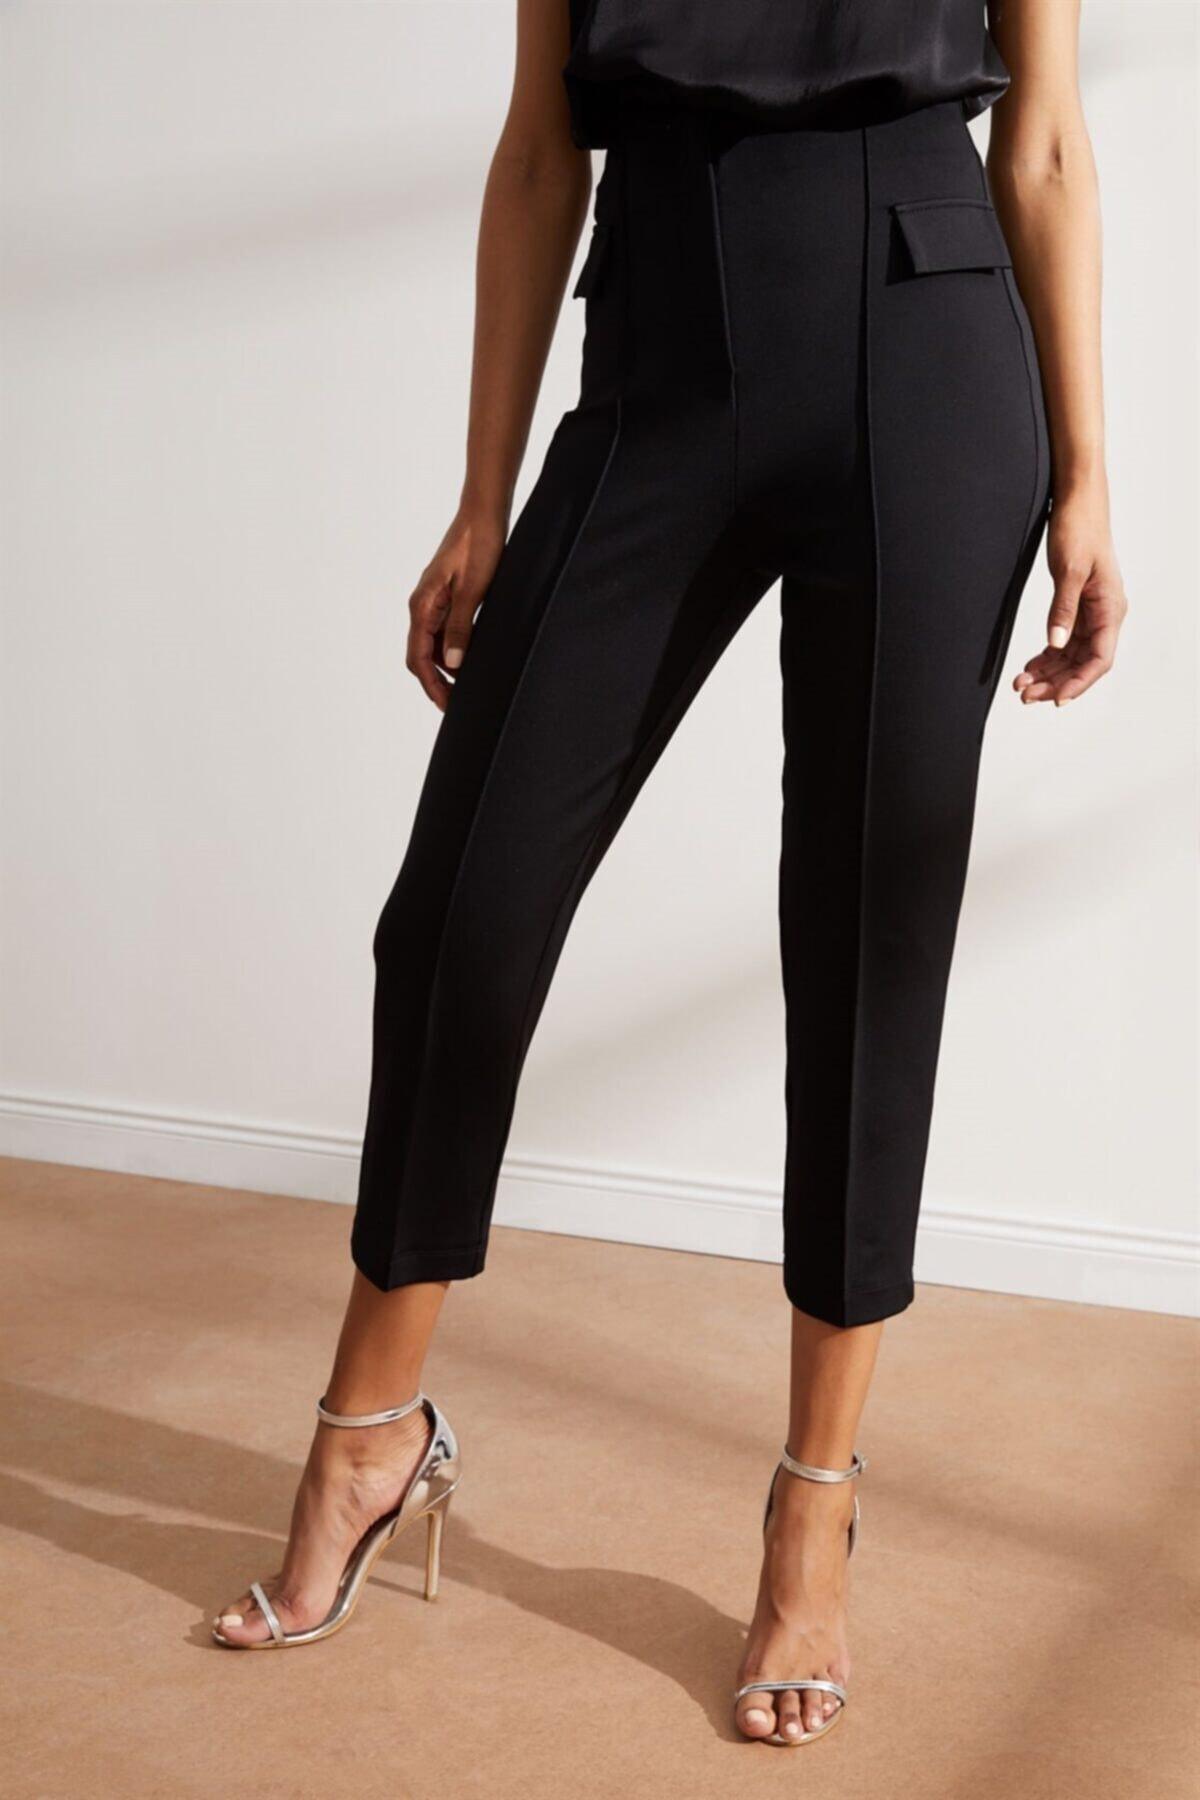 Setre Kadın Siyah Yüksek Bel Kat Izli Kumaş Pantolon 2